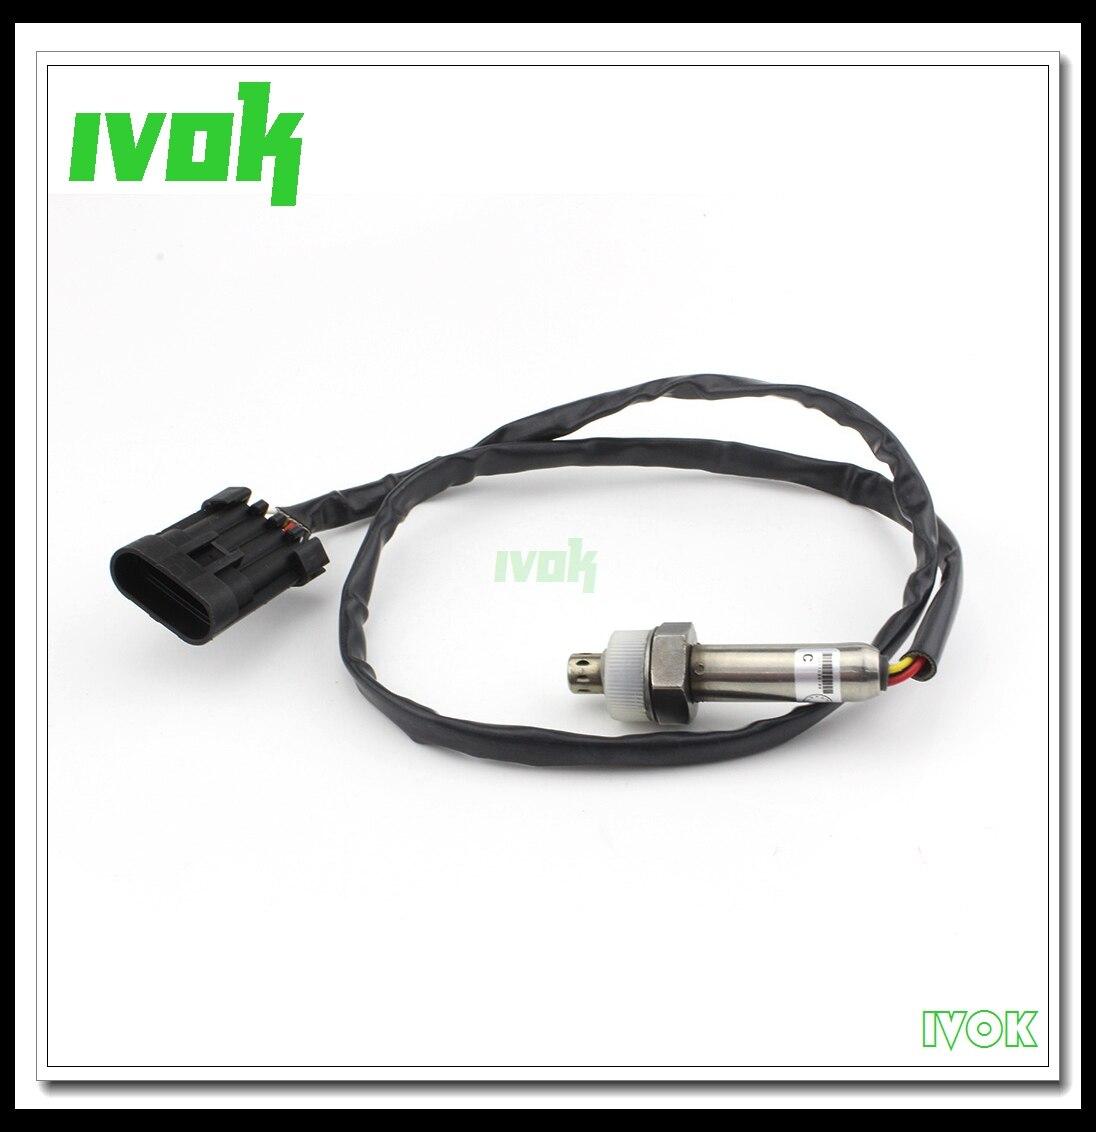 O2 Lambda capteur d'oxygène pour Opel Vauxhall Astra Vectra Calibra Zafira 855330 0855330 90528253 90411959